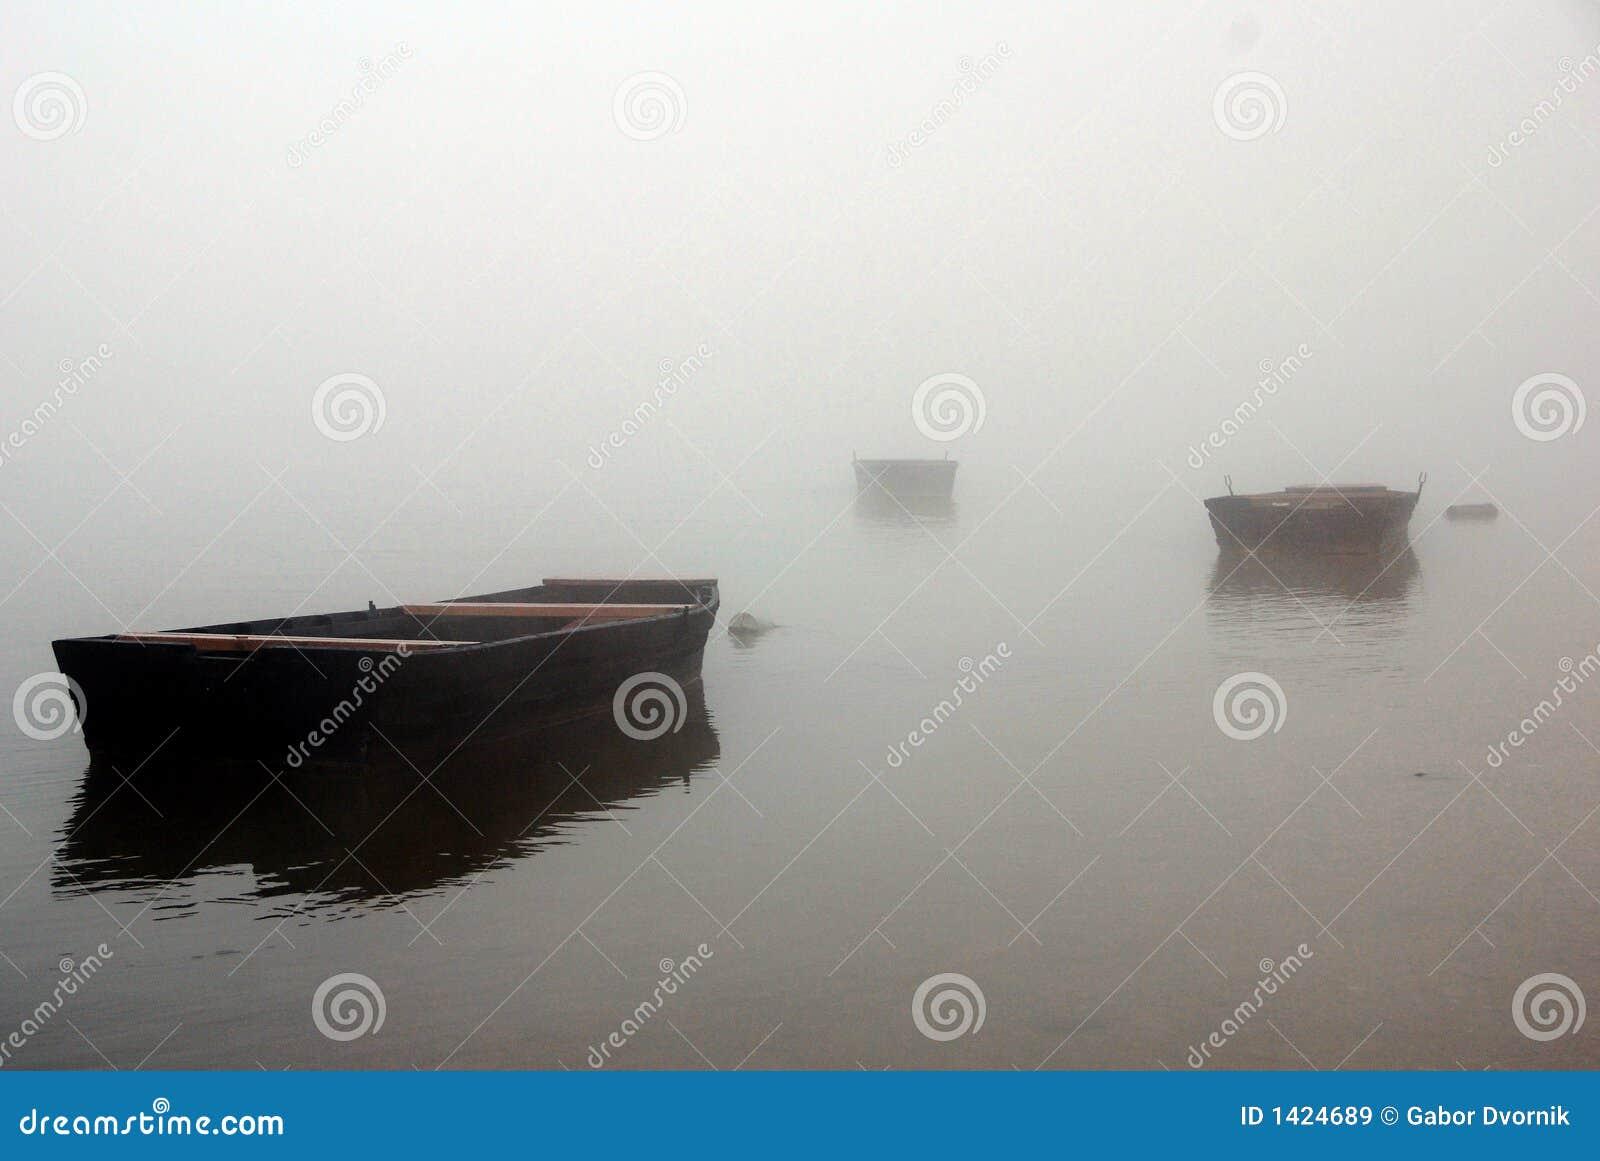 Silent river